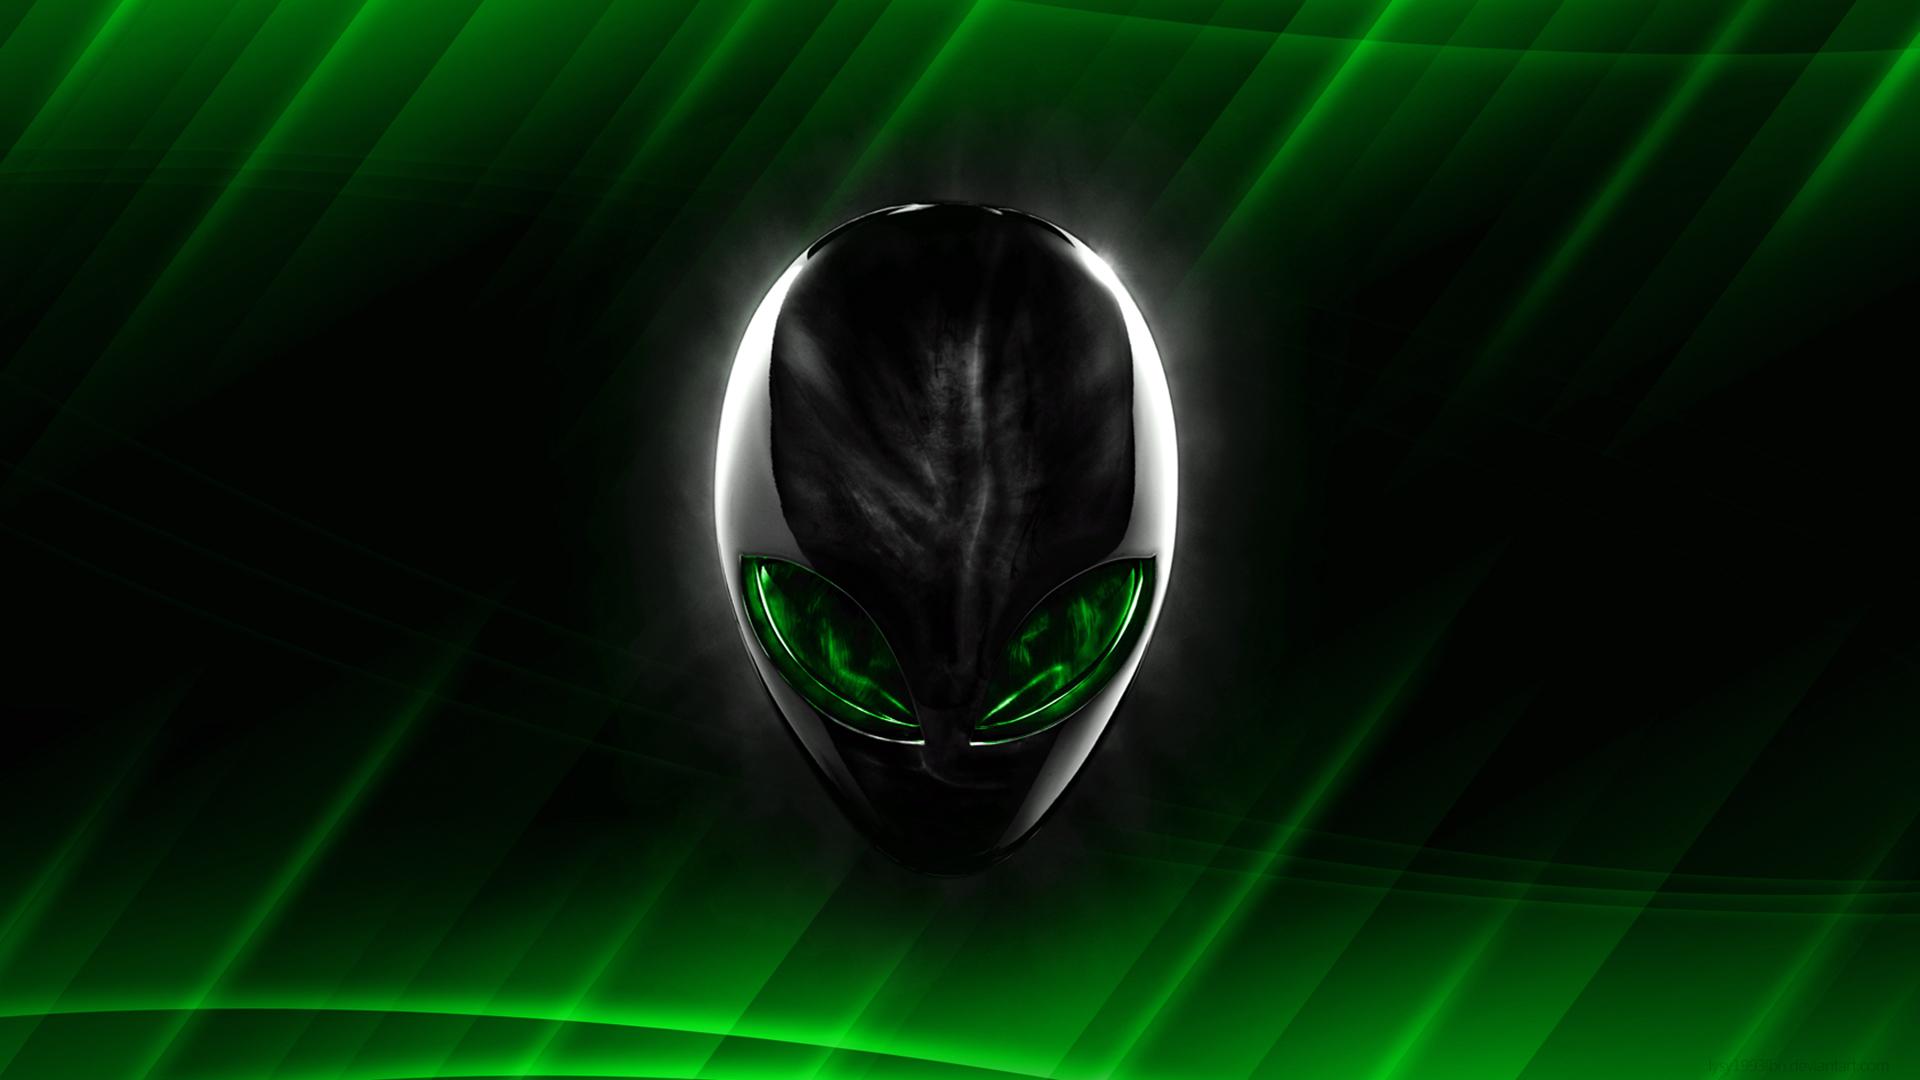 pin pin alienware green desktop wallpapers and stock